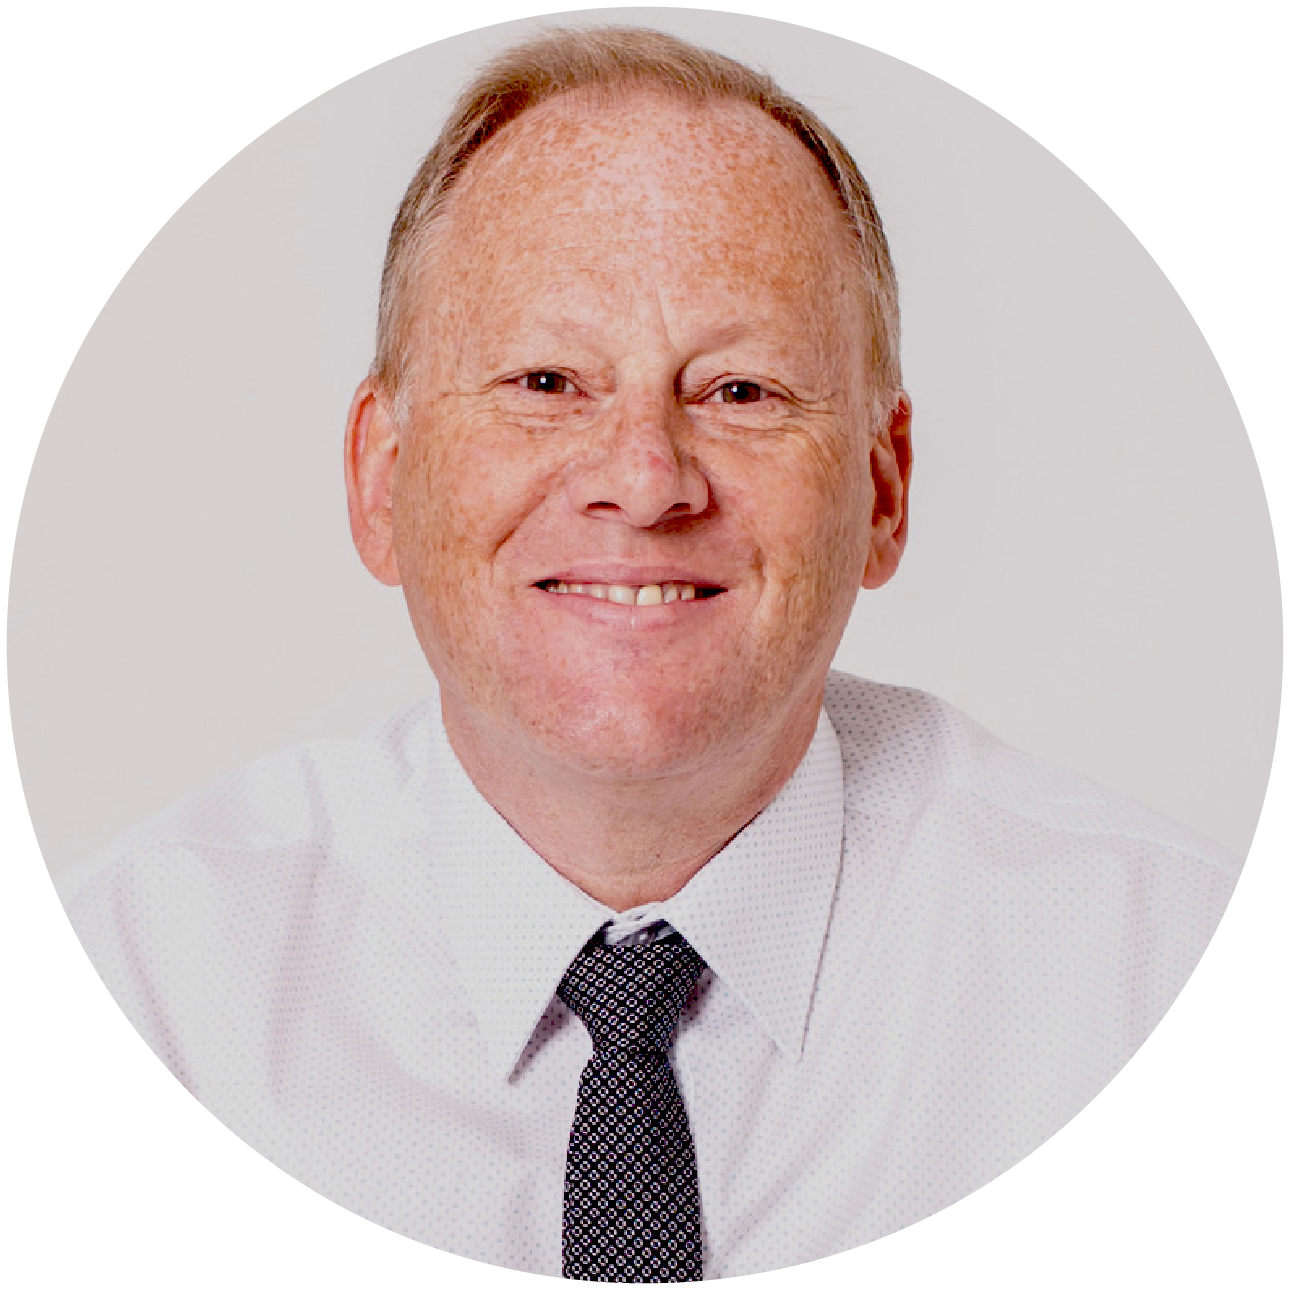 Ian Piddington - Educational Consultant